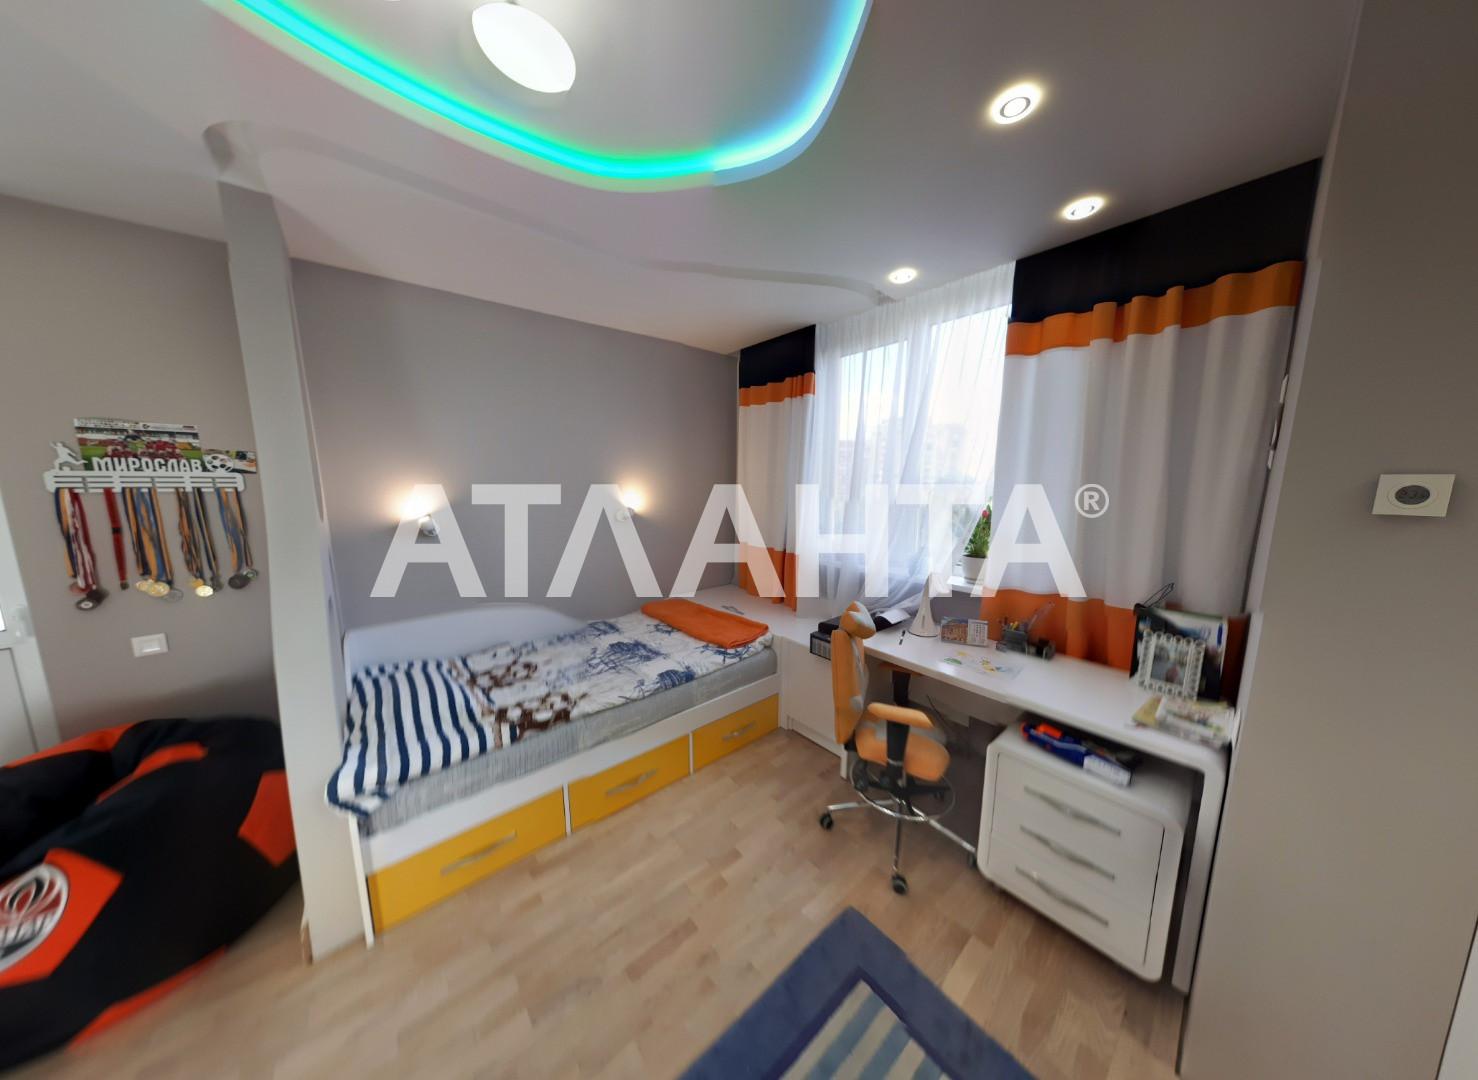 Продается 3-комнатная Квартира на ул. Ул. Ломоносова — 230 000 у.е. (фото №12)